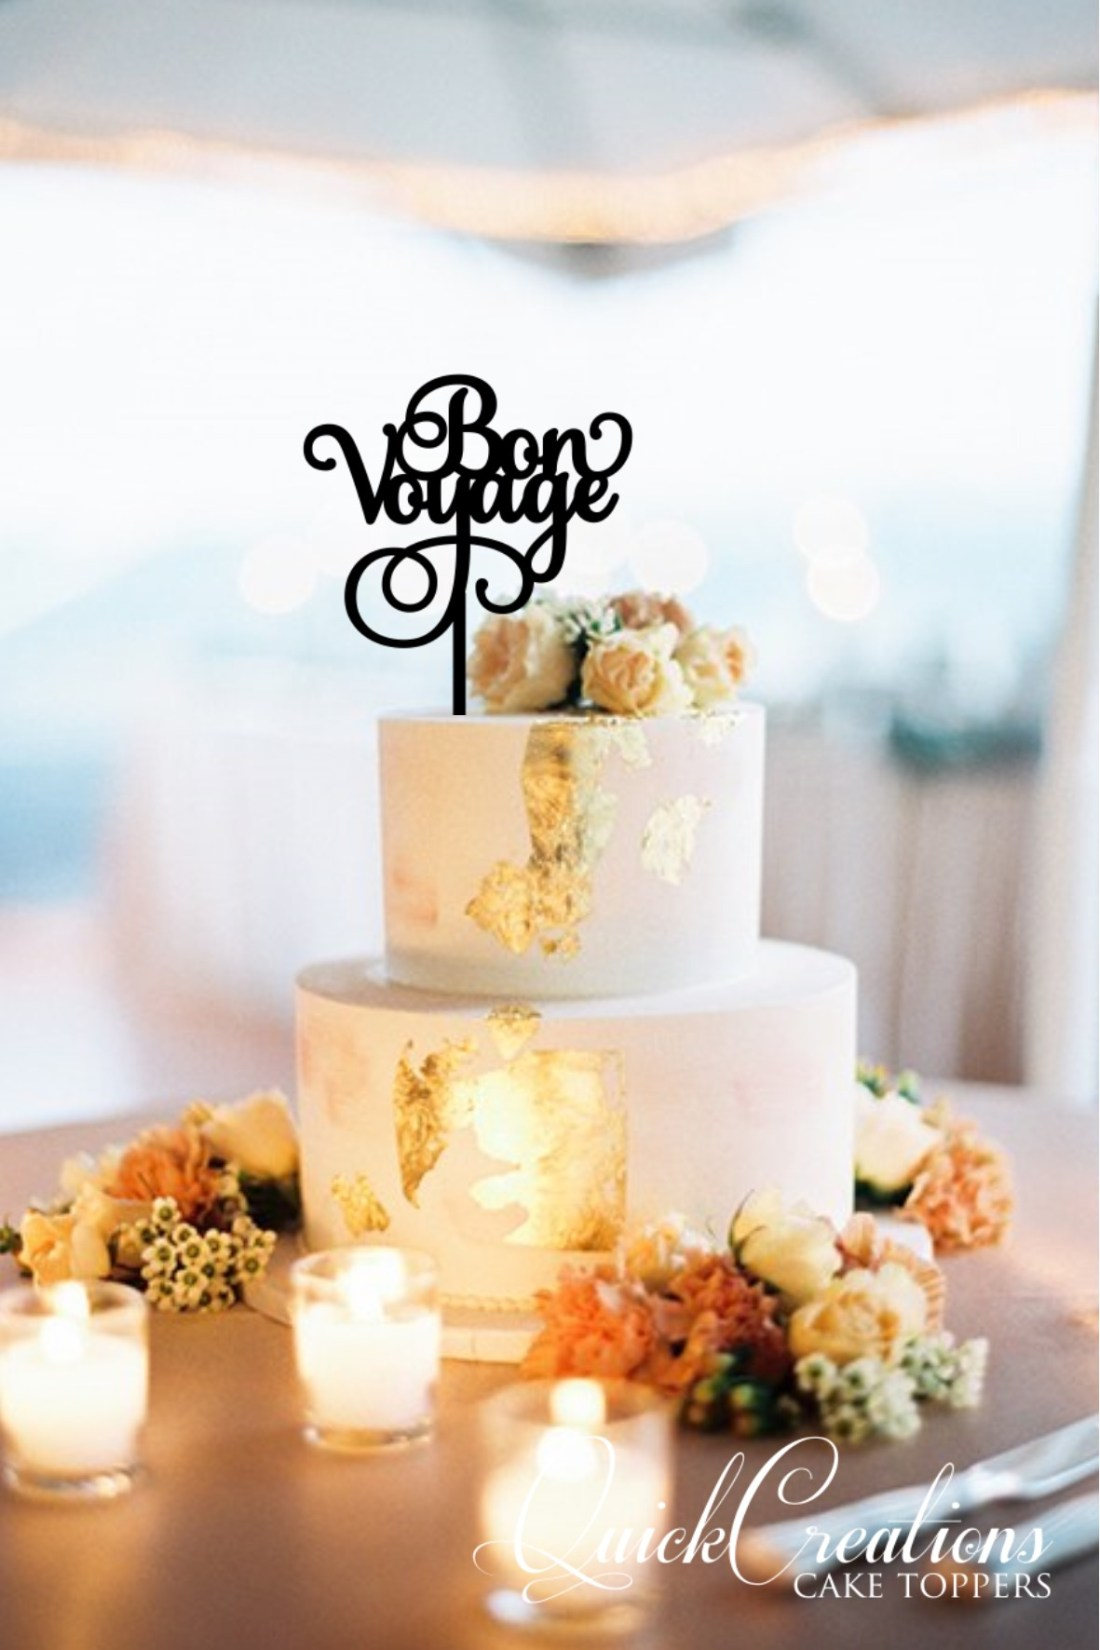 Quick Creations Cake Topper- Bon Voyage